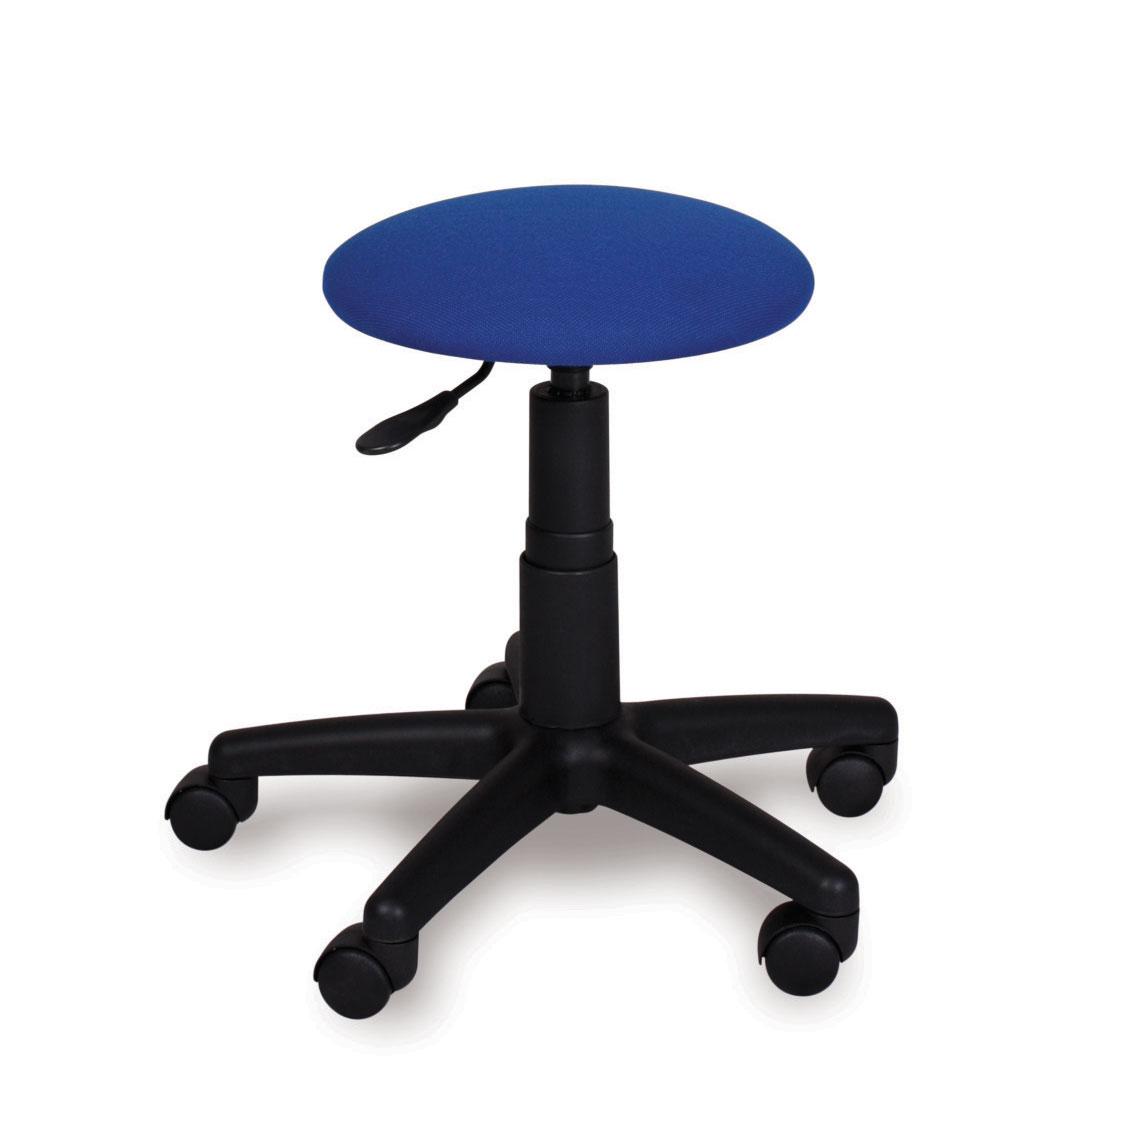 187 Ts Teachers Stooladvanced Furniture